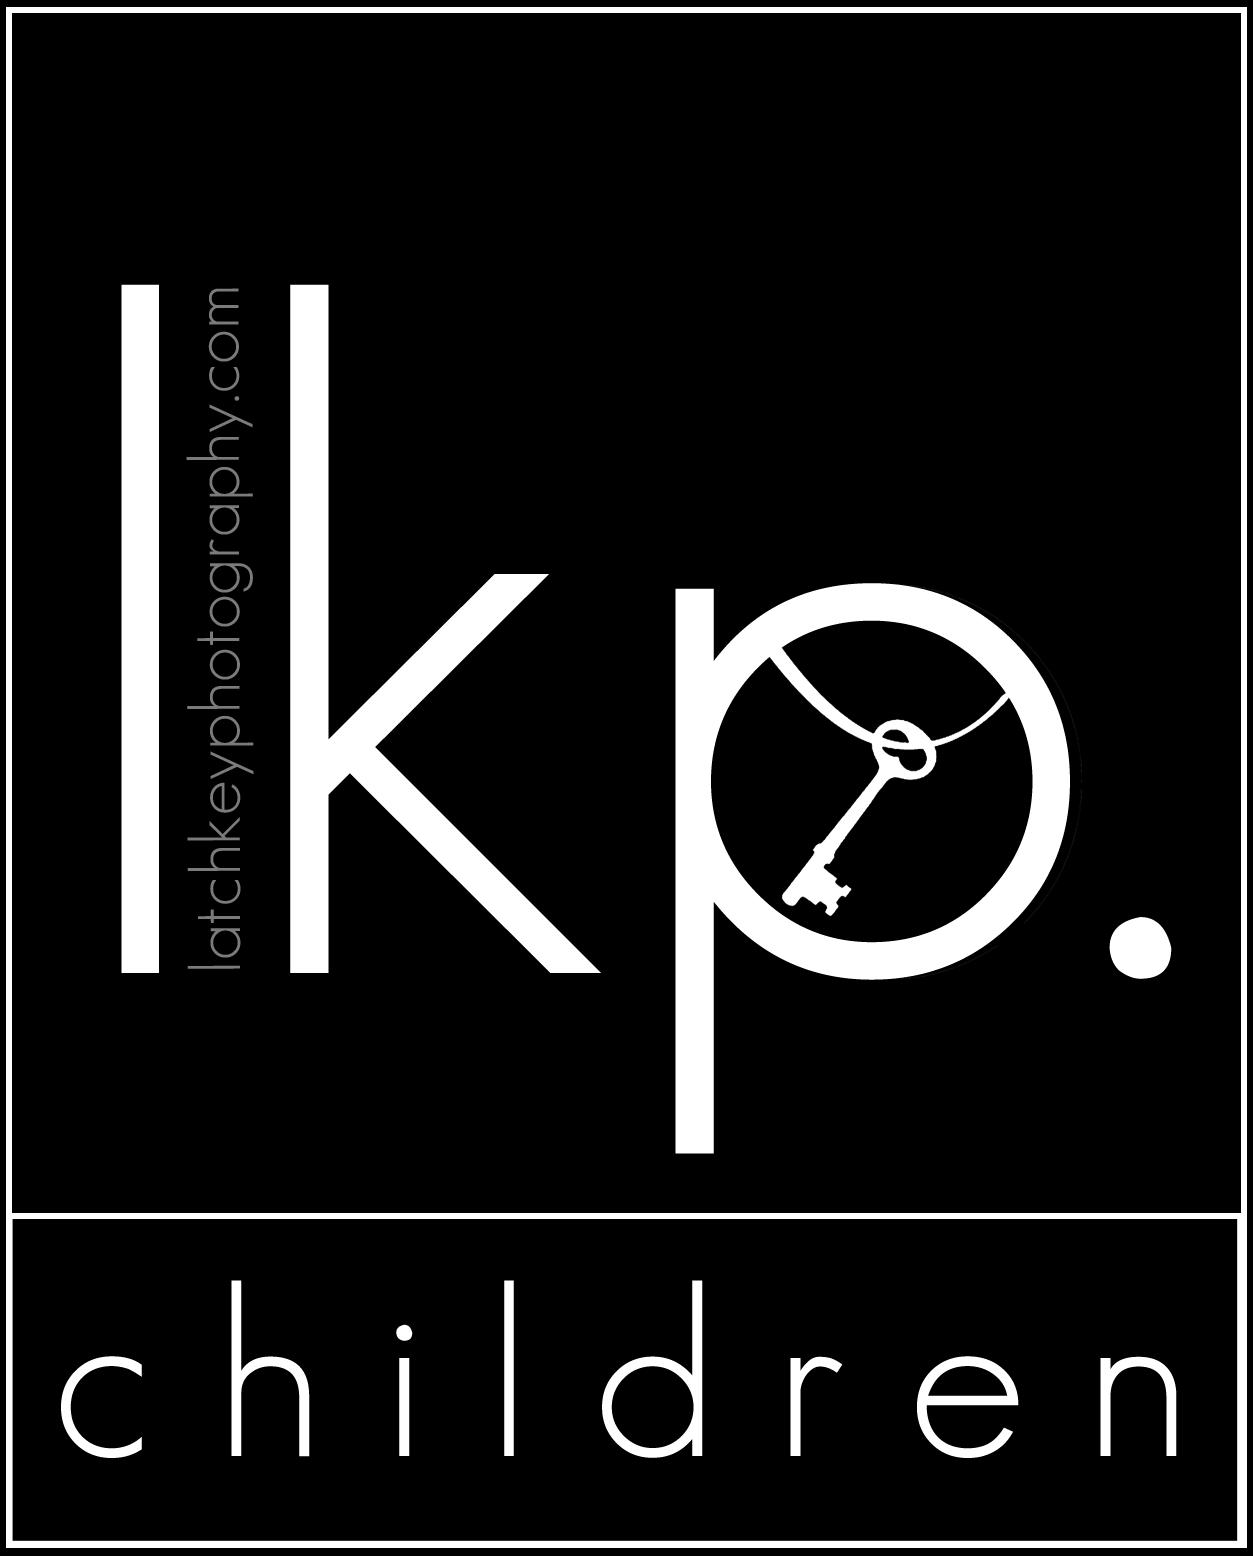 http://1.bp.blogspot.com/-bvgBc3yqKCE/To1YgGGvwjI/AAAAAAAAEt4/uPnOfZdhoBk/s1600/2011+LKP+children+4pt177x5pt187in+300ppi.png